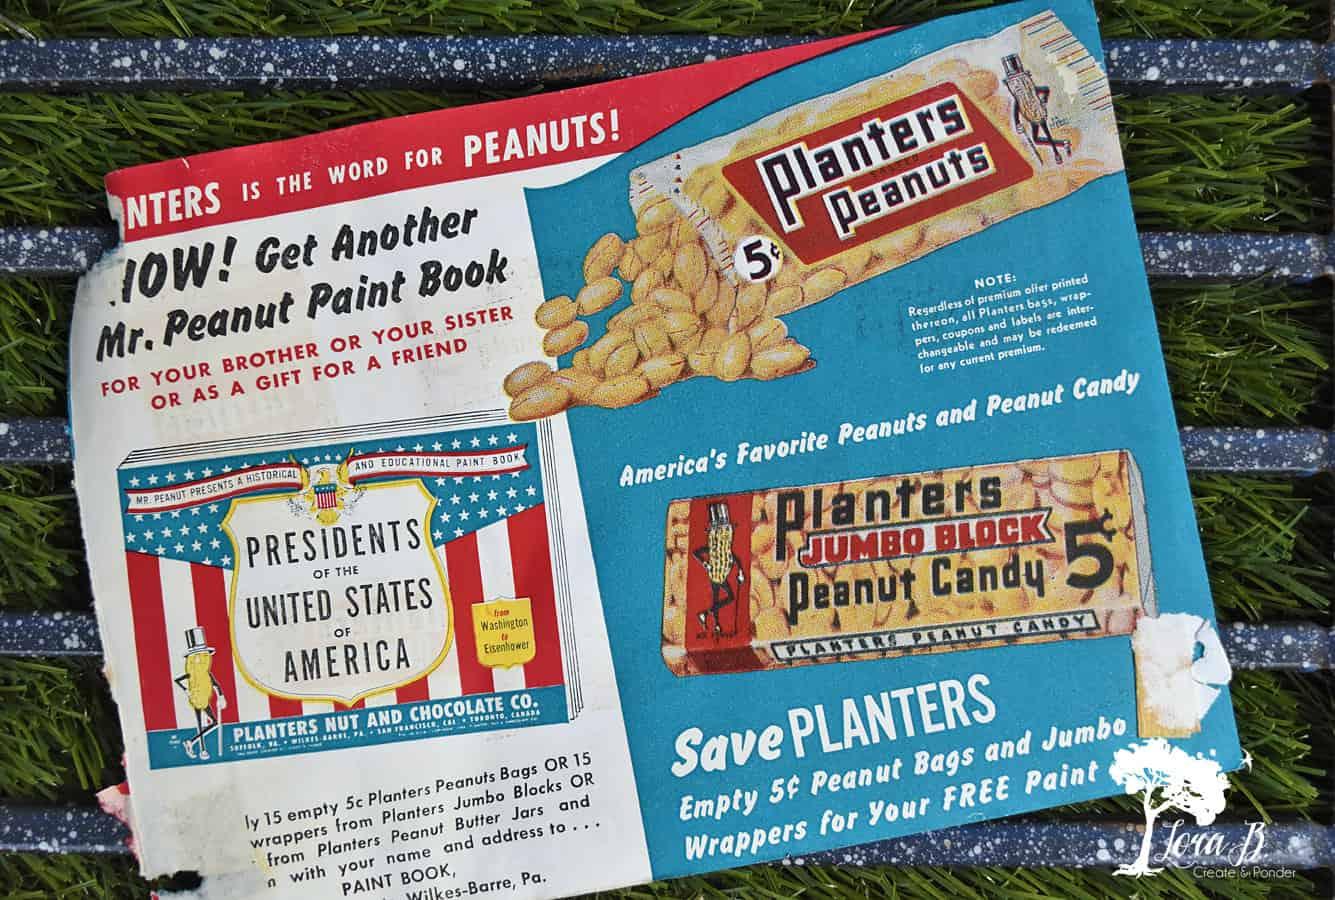 Planter's Peanuts ad